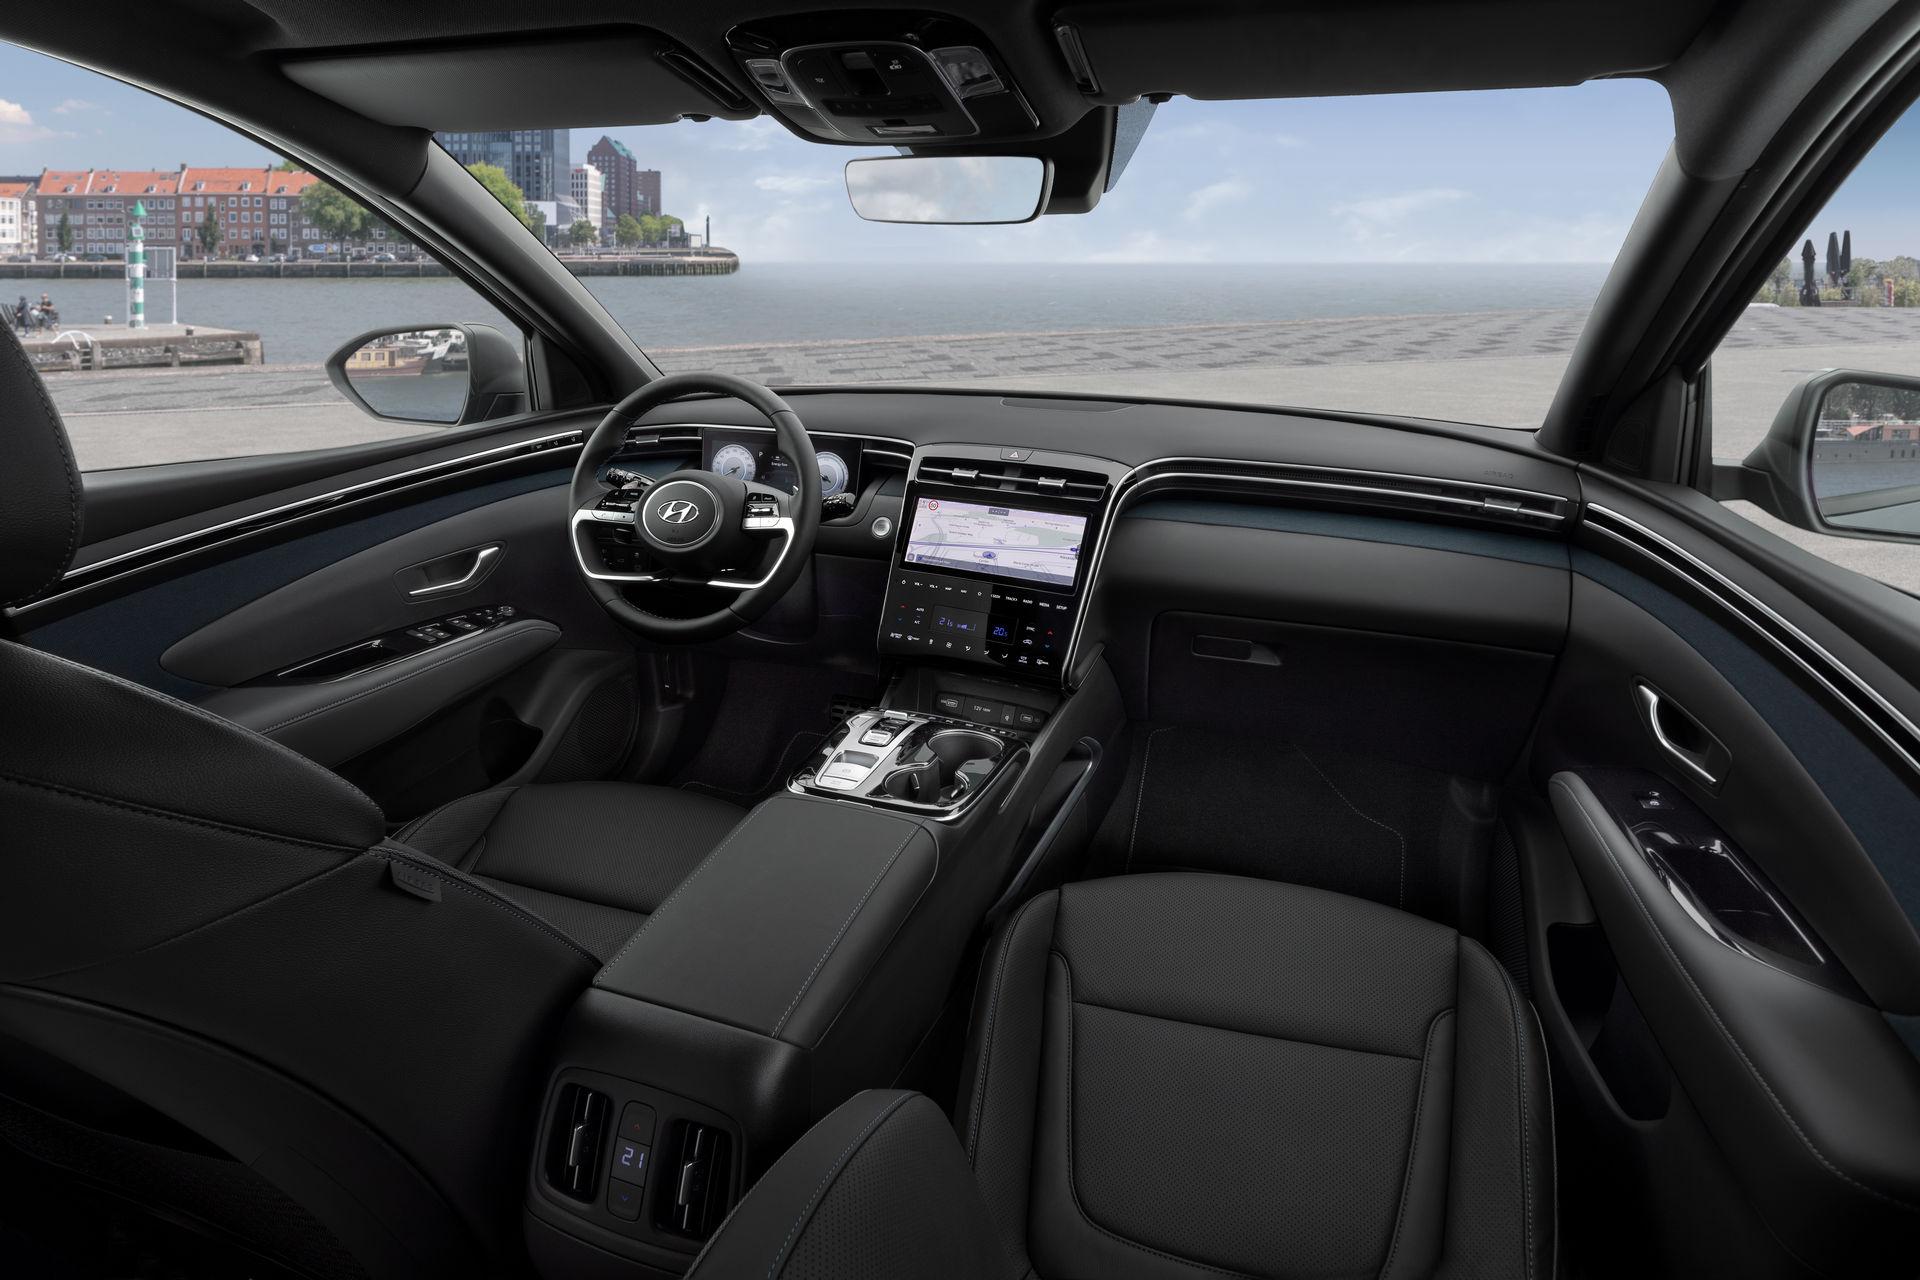 2022 hyundai tucson sel awddescription: 2022 Hyundai Tucson Has A Radical Design Coming To The U S Next Year Carscoops